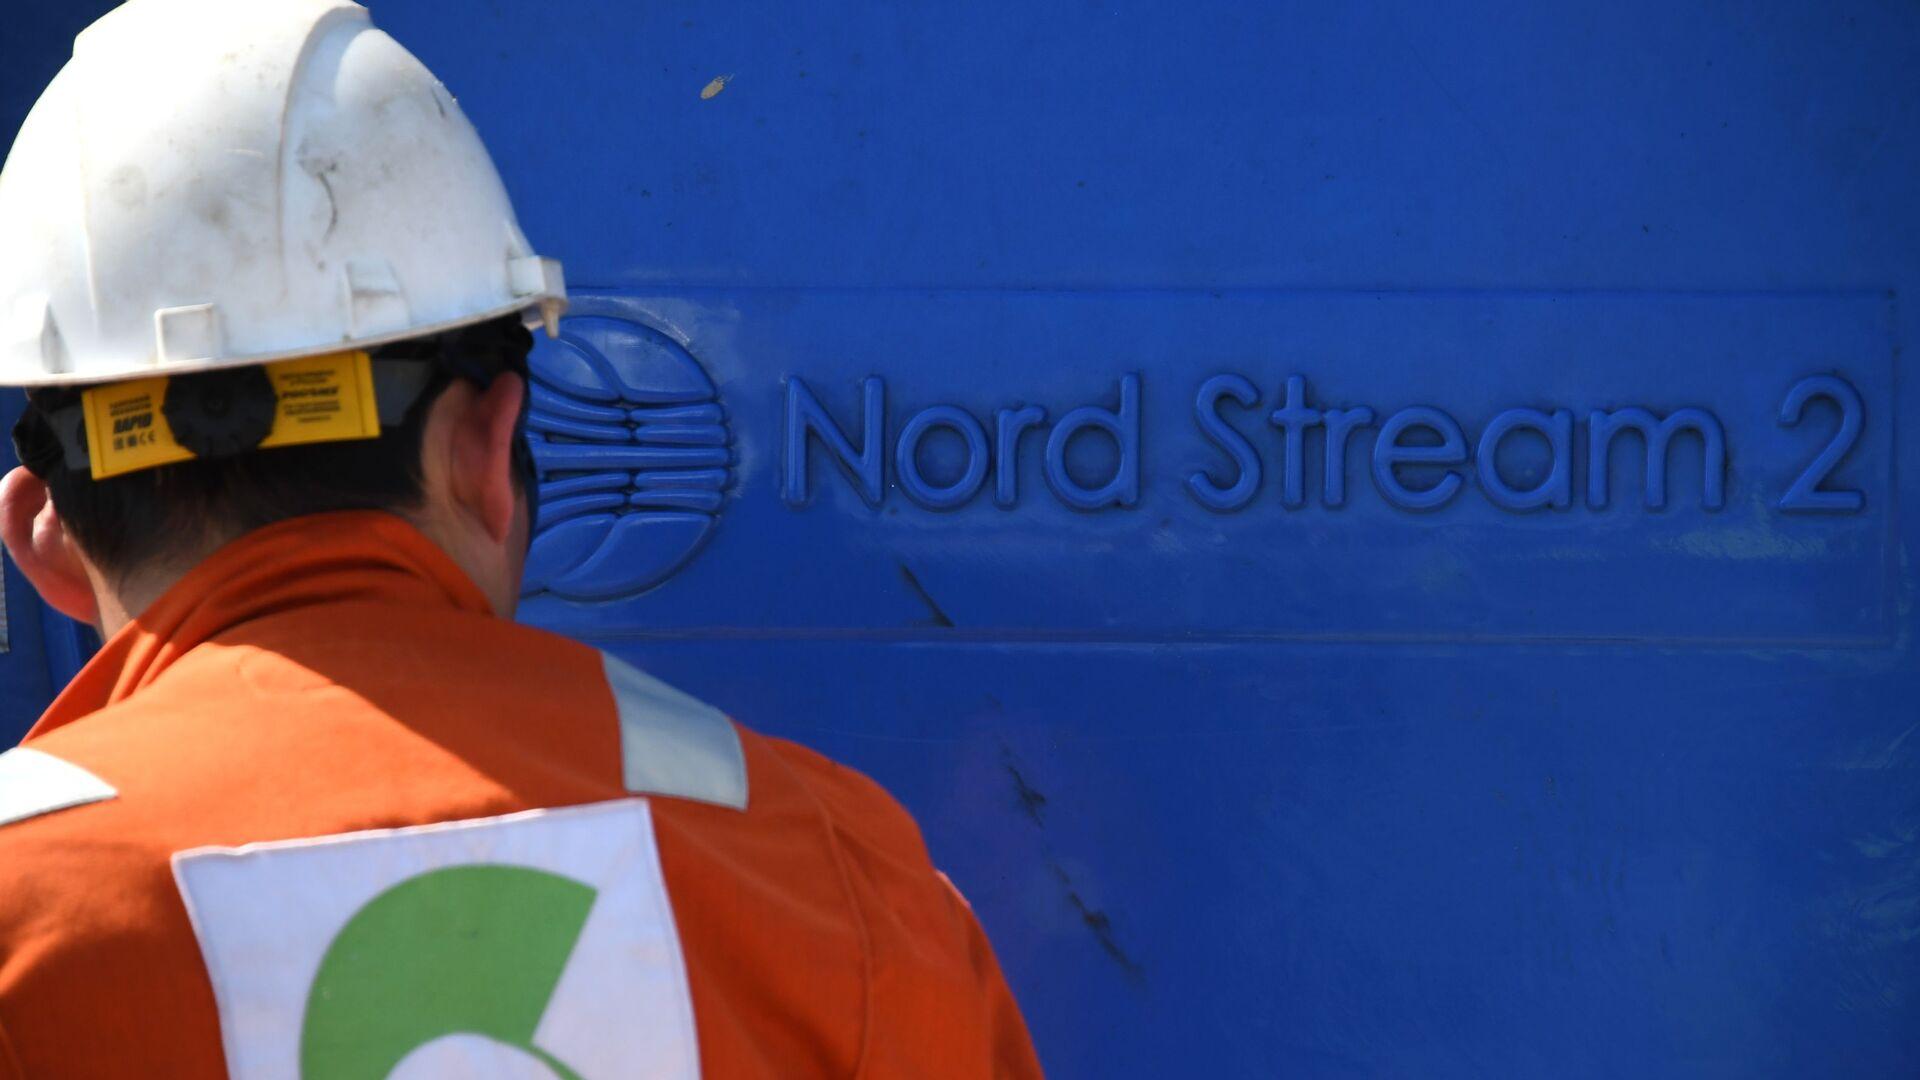 Budowa Nord Stream 2 - Sputnik Polska, 1920, 05.10.2021